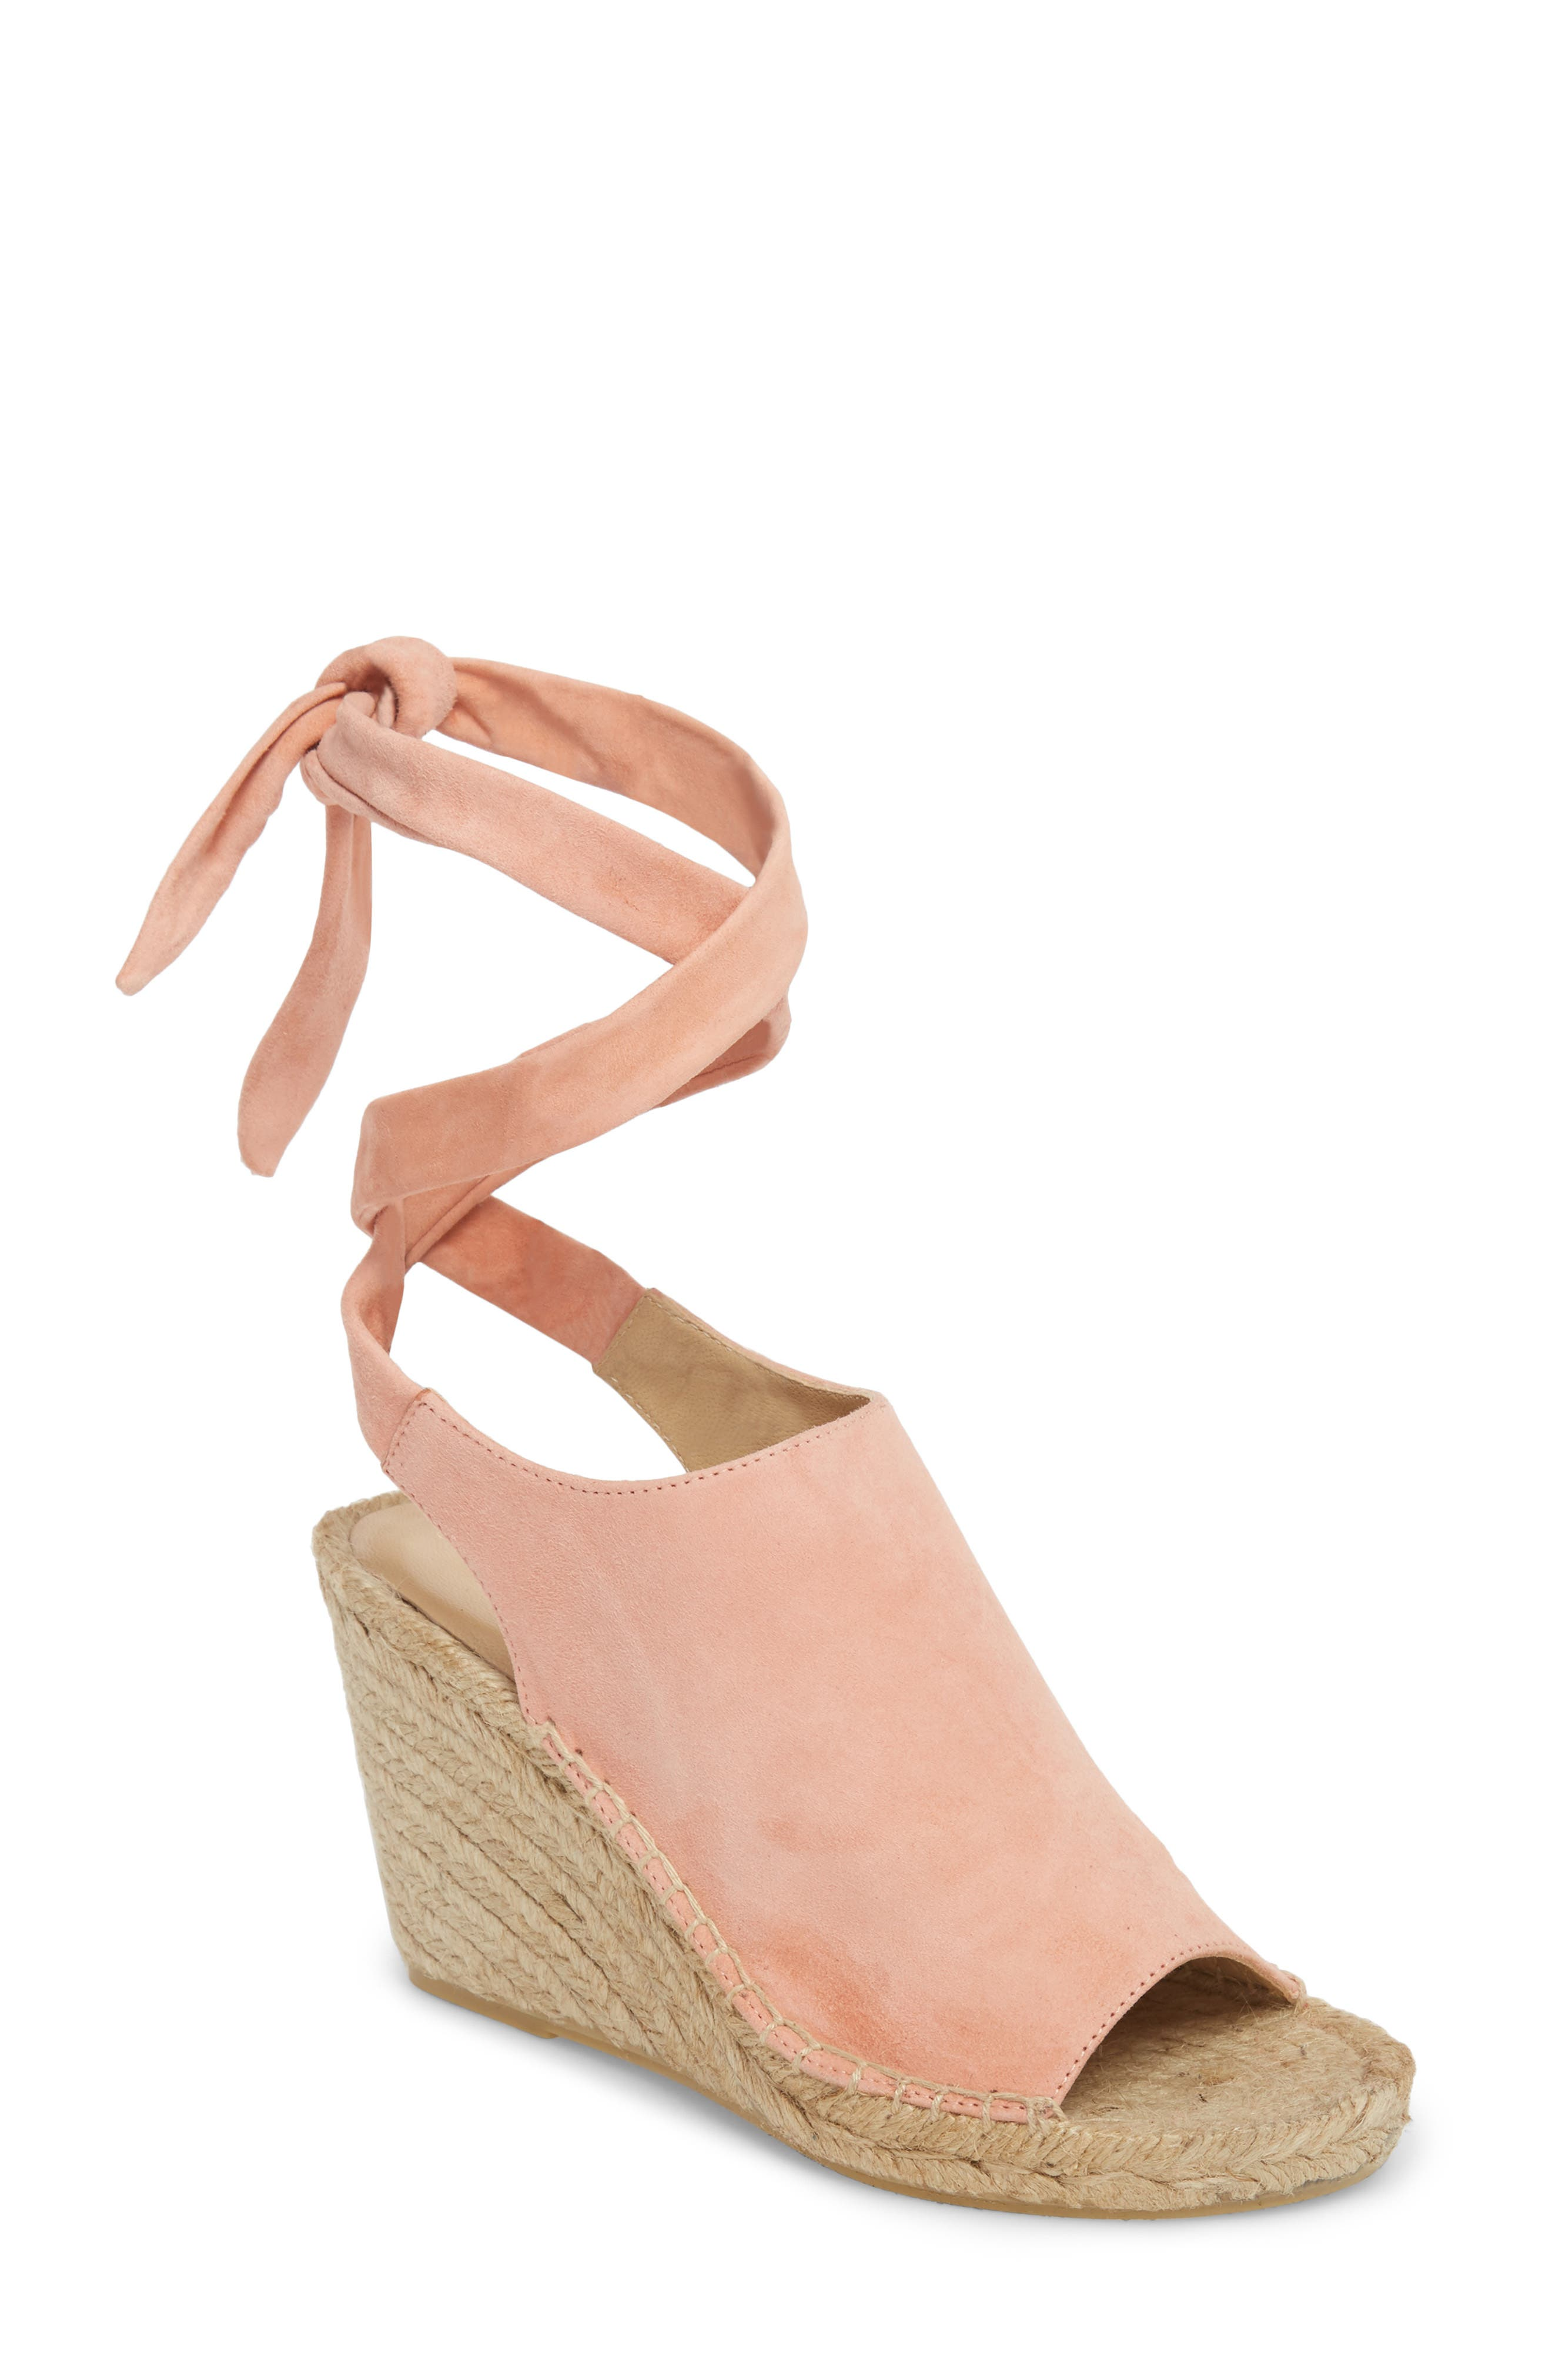 Etienne Aigner Vie Espadrille Wedge Sandal, Pink